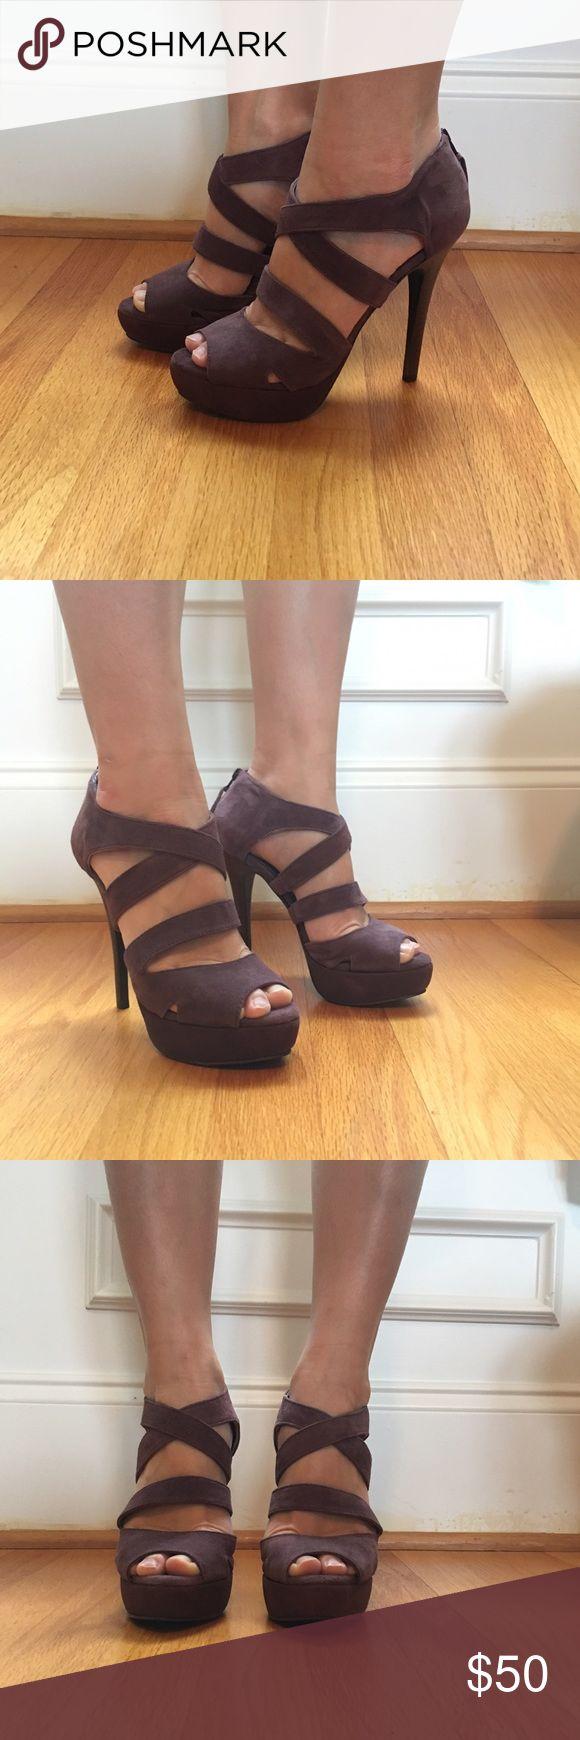 Shoestock, New Purple Suede Pumps, 5 Fits like 6 Shoestock, Brand New, Purple Suede Pumps, Size 5 Fits like 6 Shoestock Shoes Heels